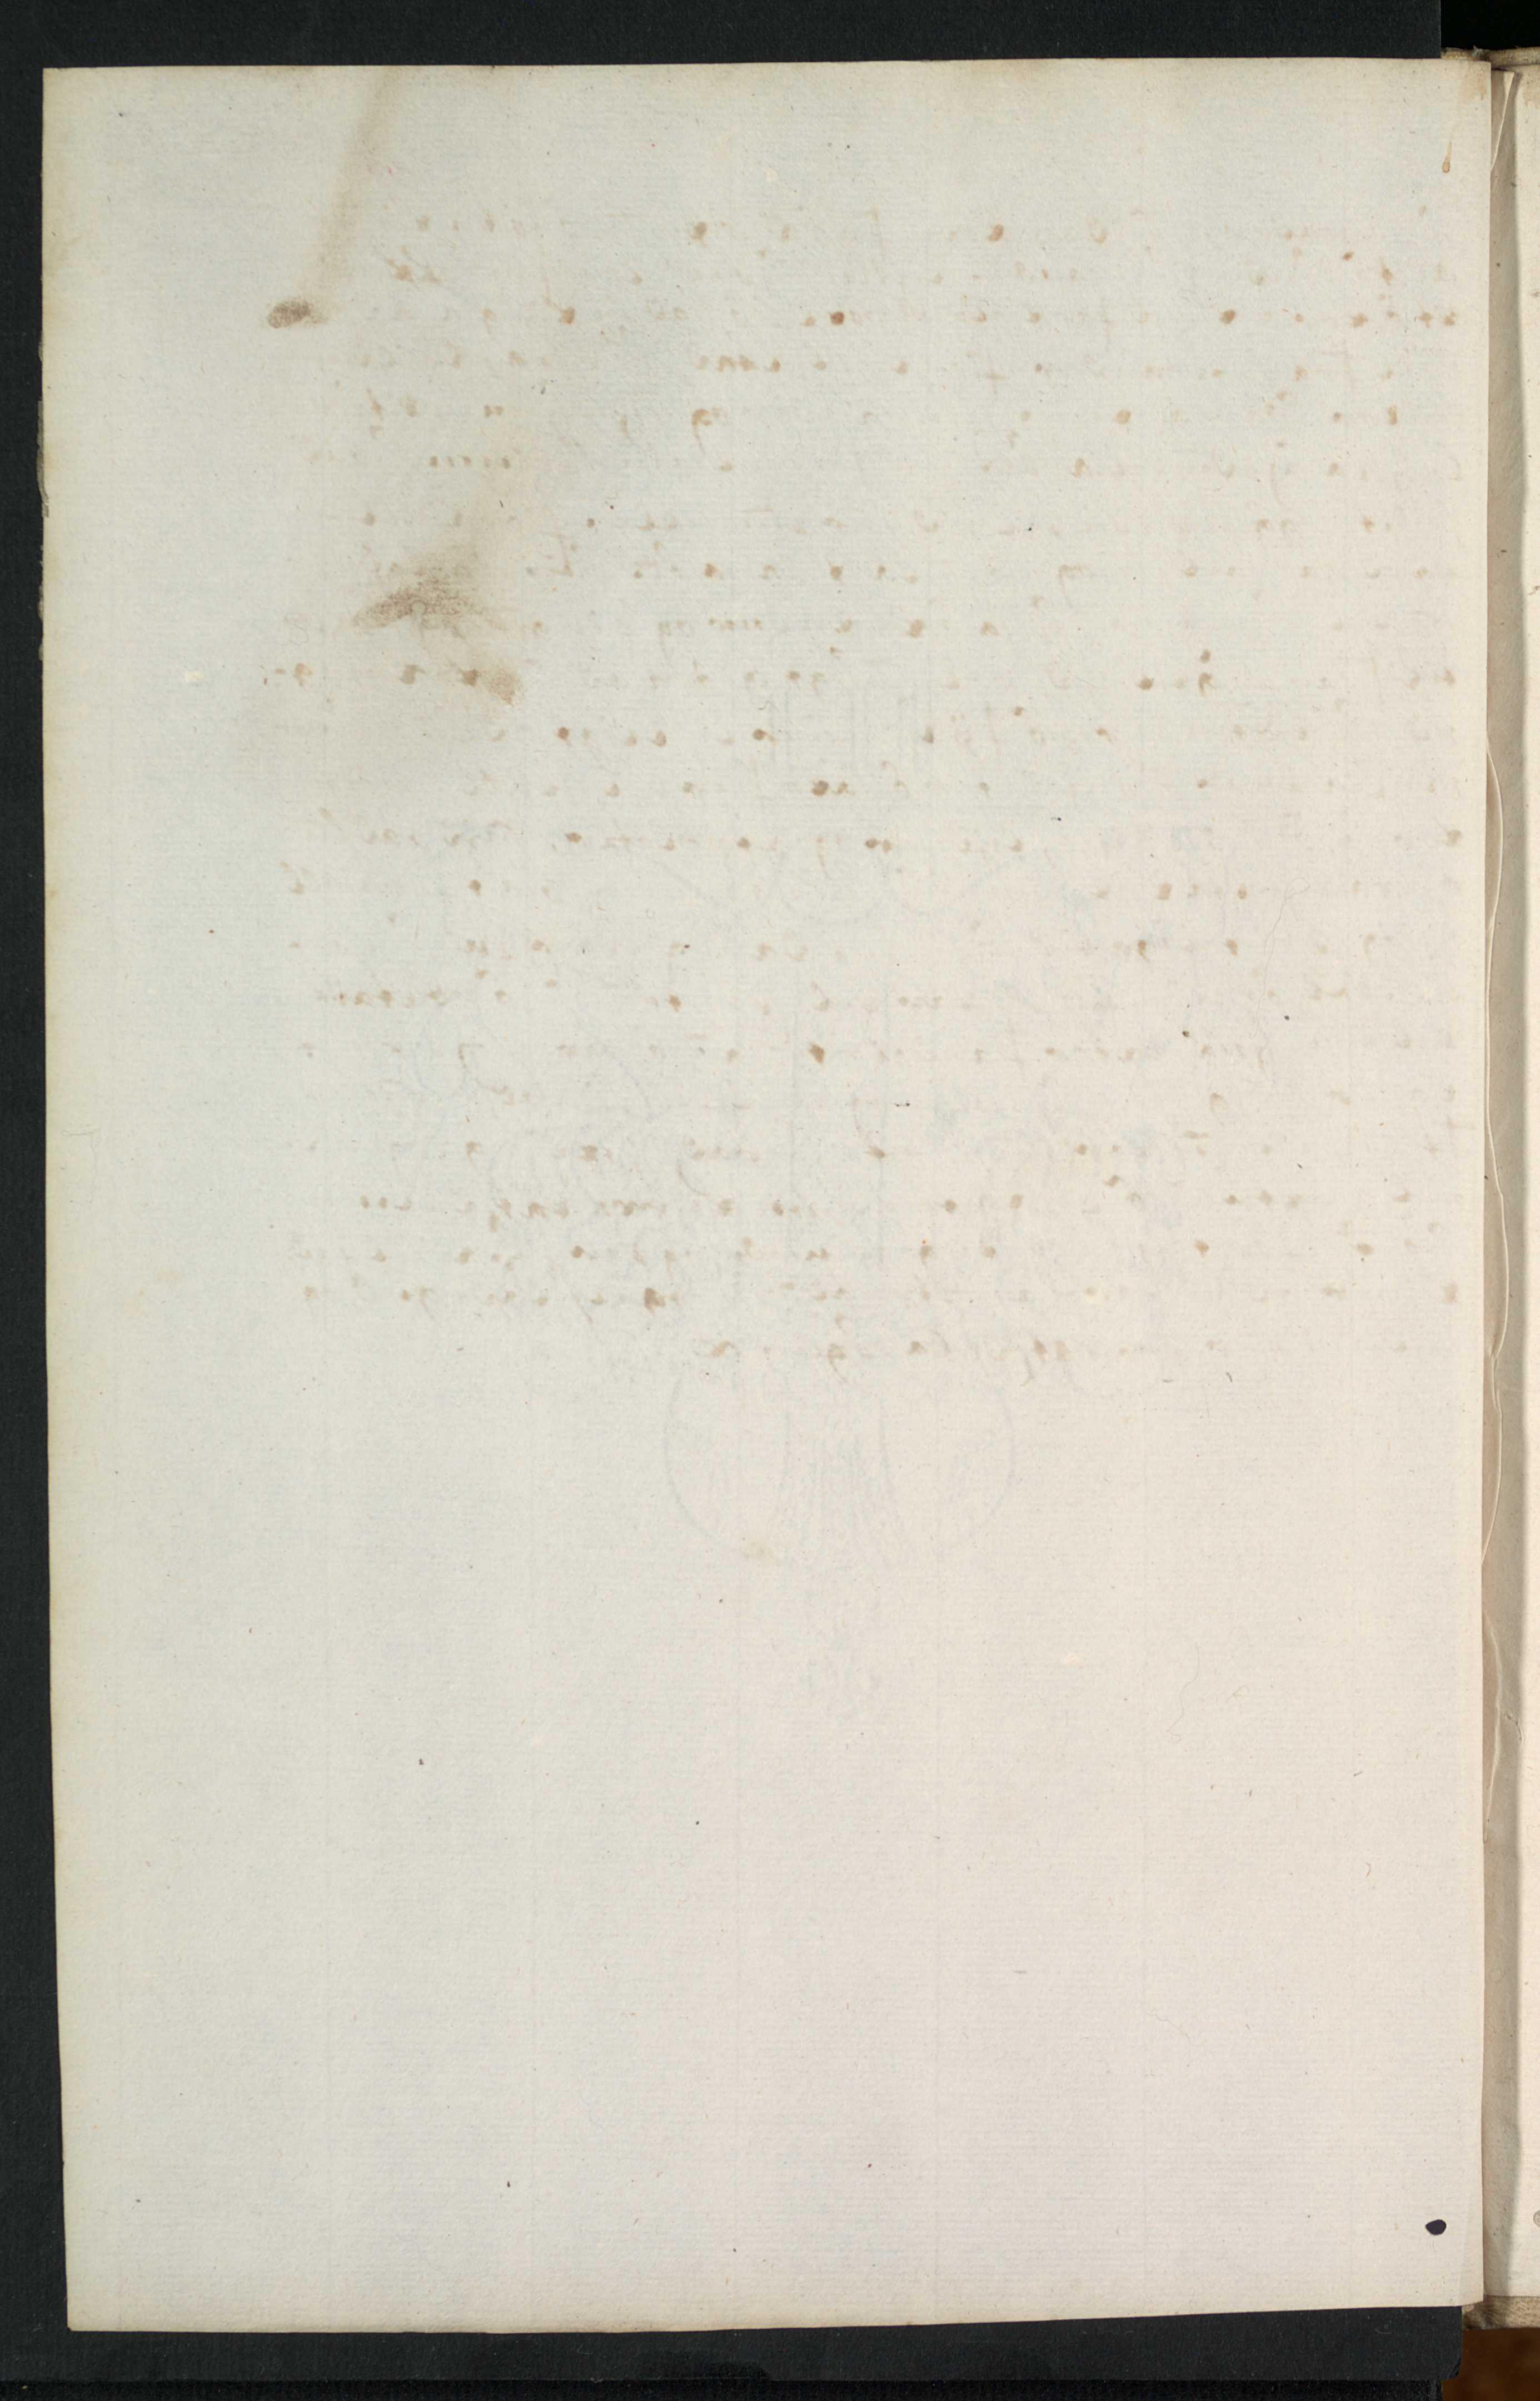 AM 138 fol - 40v